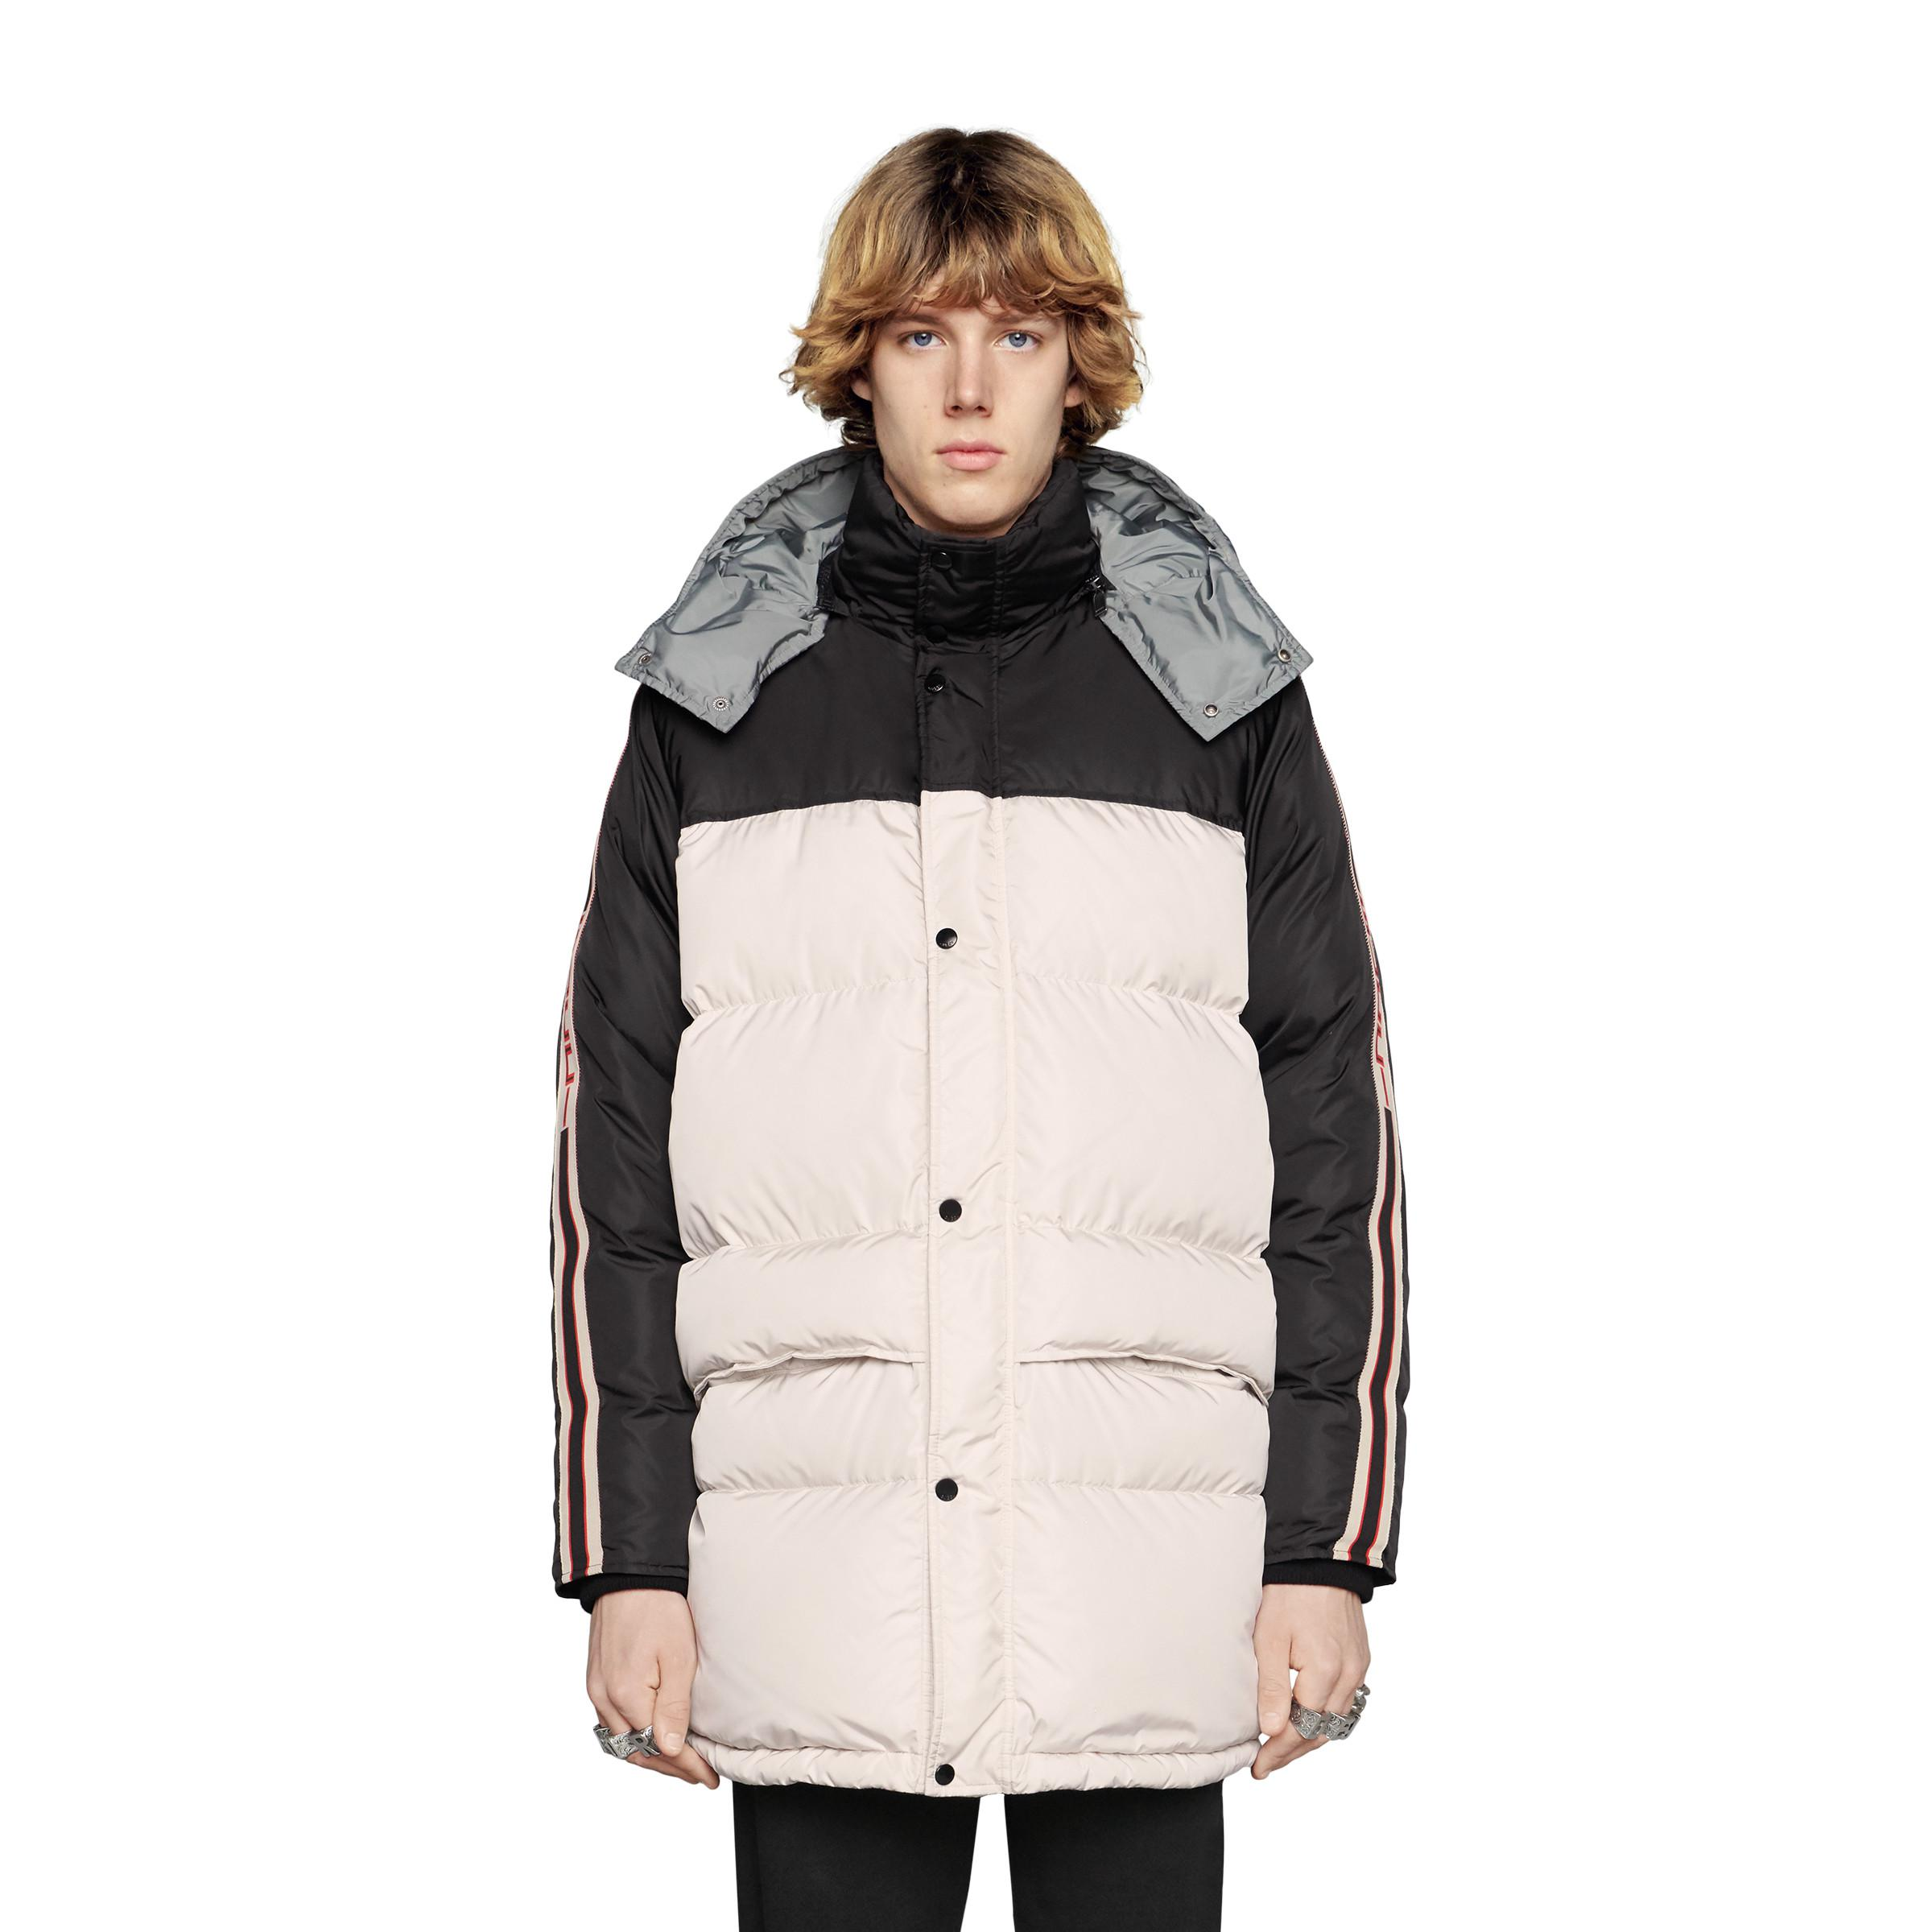 25d4369423a55 Gucci - White Nylon Coat With Stripe for Men - Lyst. View fullscreen